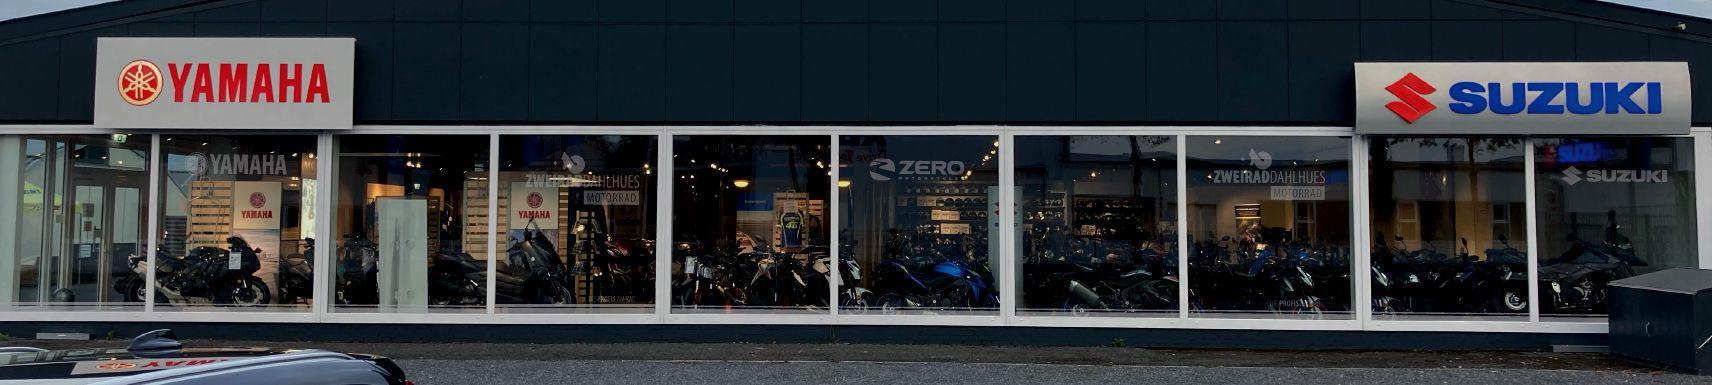 Zweirad Dahlhues Motorrad GmbH & Co KG